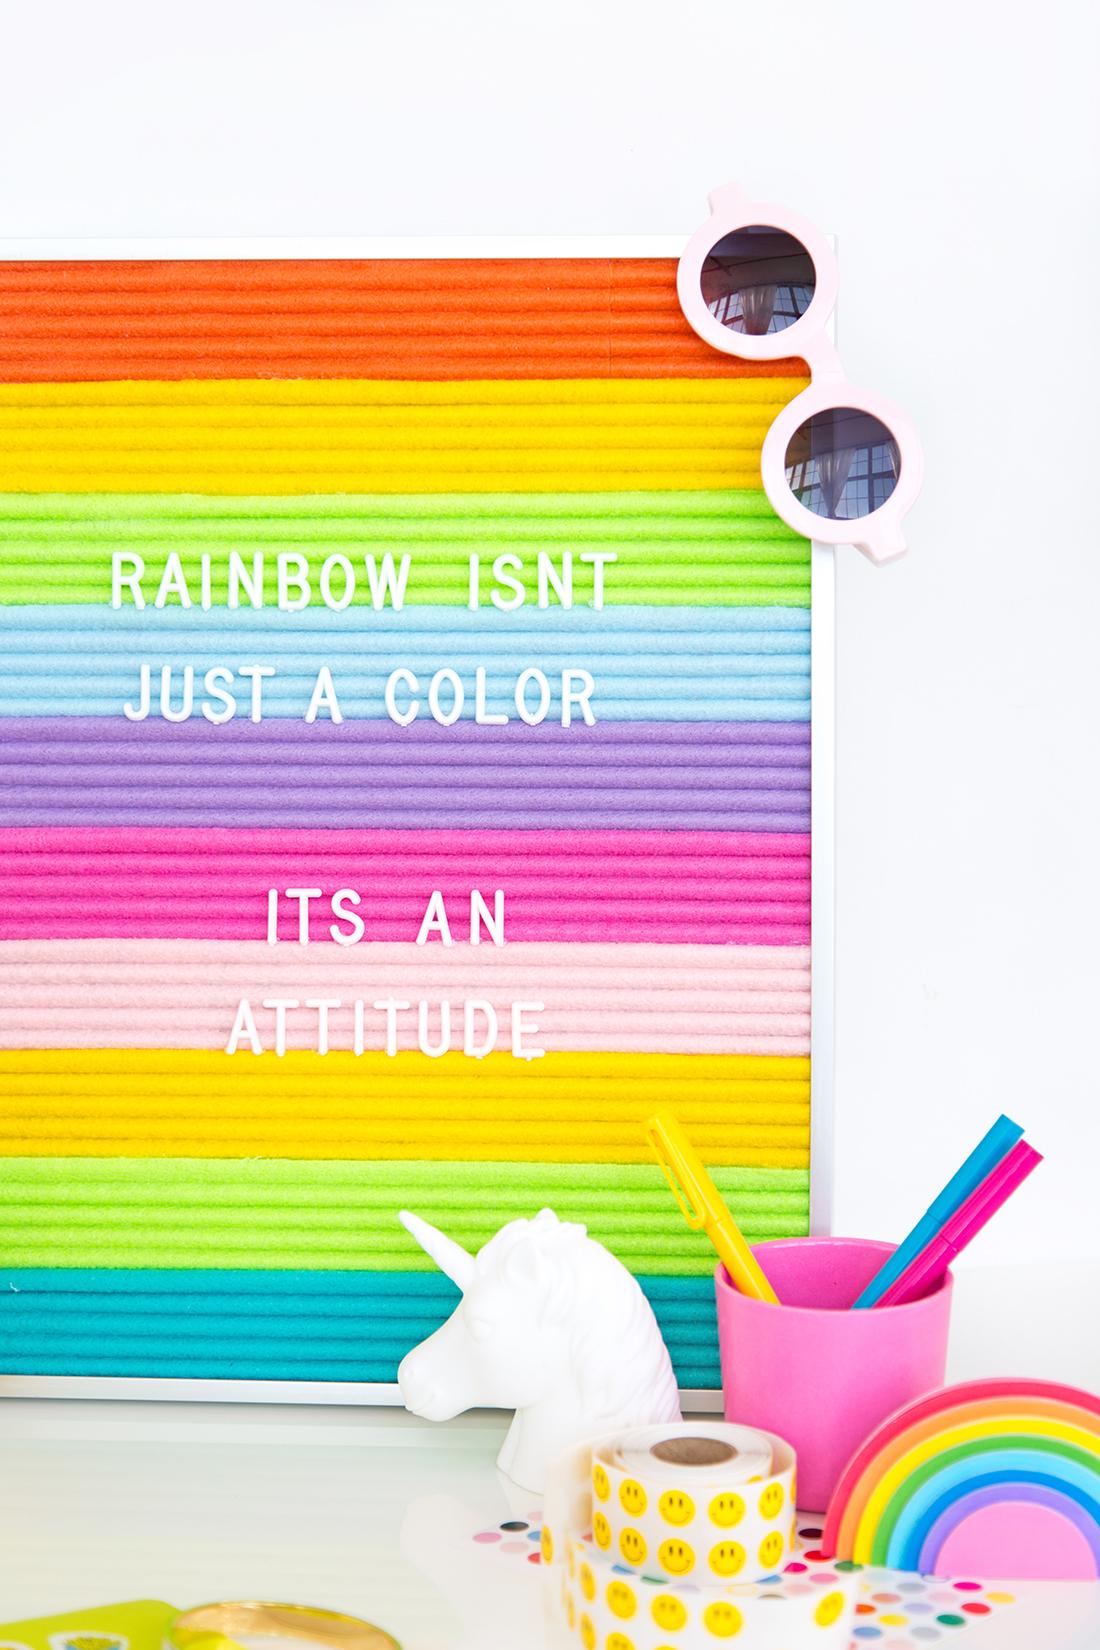 50 Easy Handmade Gift Ideas You'll Love: DIY Rainbow Felt Letterboard from Aww Sam